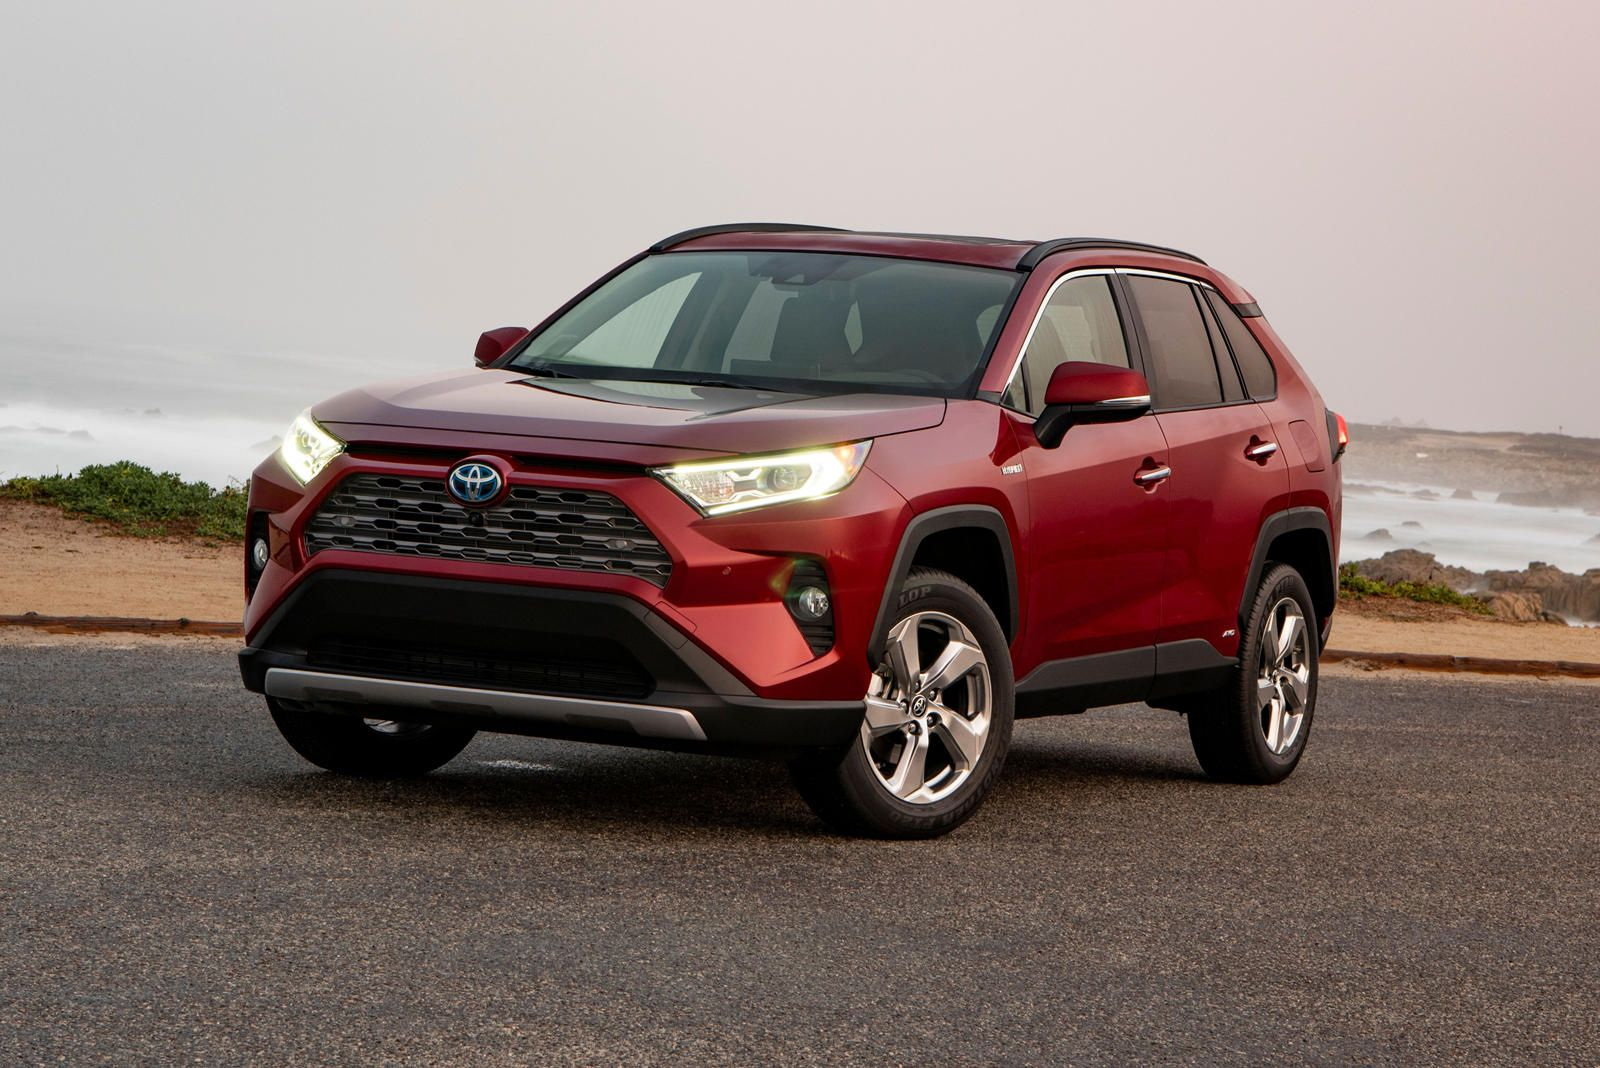 2020 Toyota Rav4 Hybrid Test Drive Review The Best Seller For A Reason In 2020 Toyota Rav4 Hybrid Toyota Rav4 Toyota